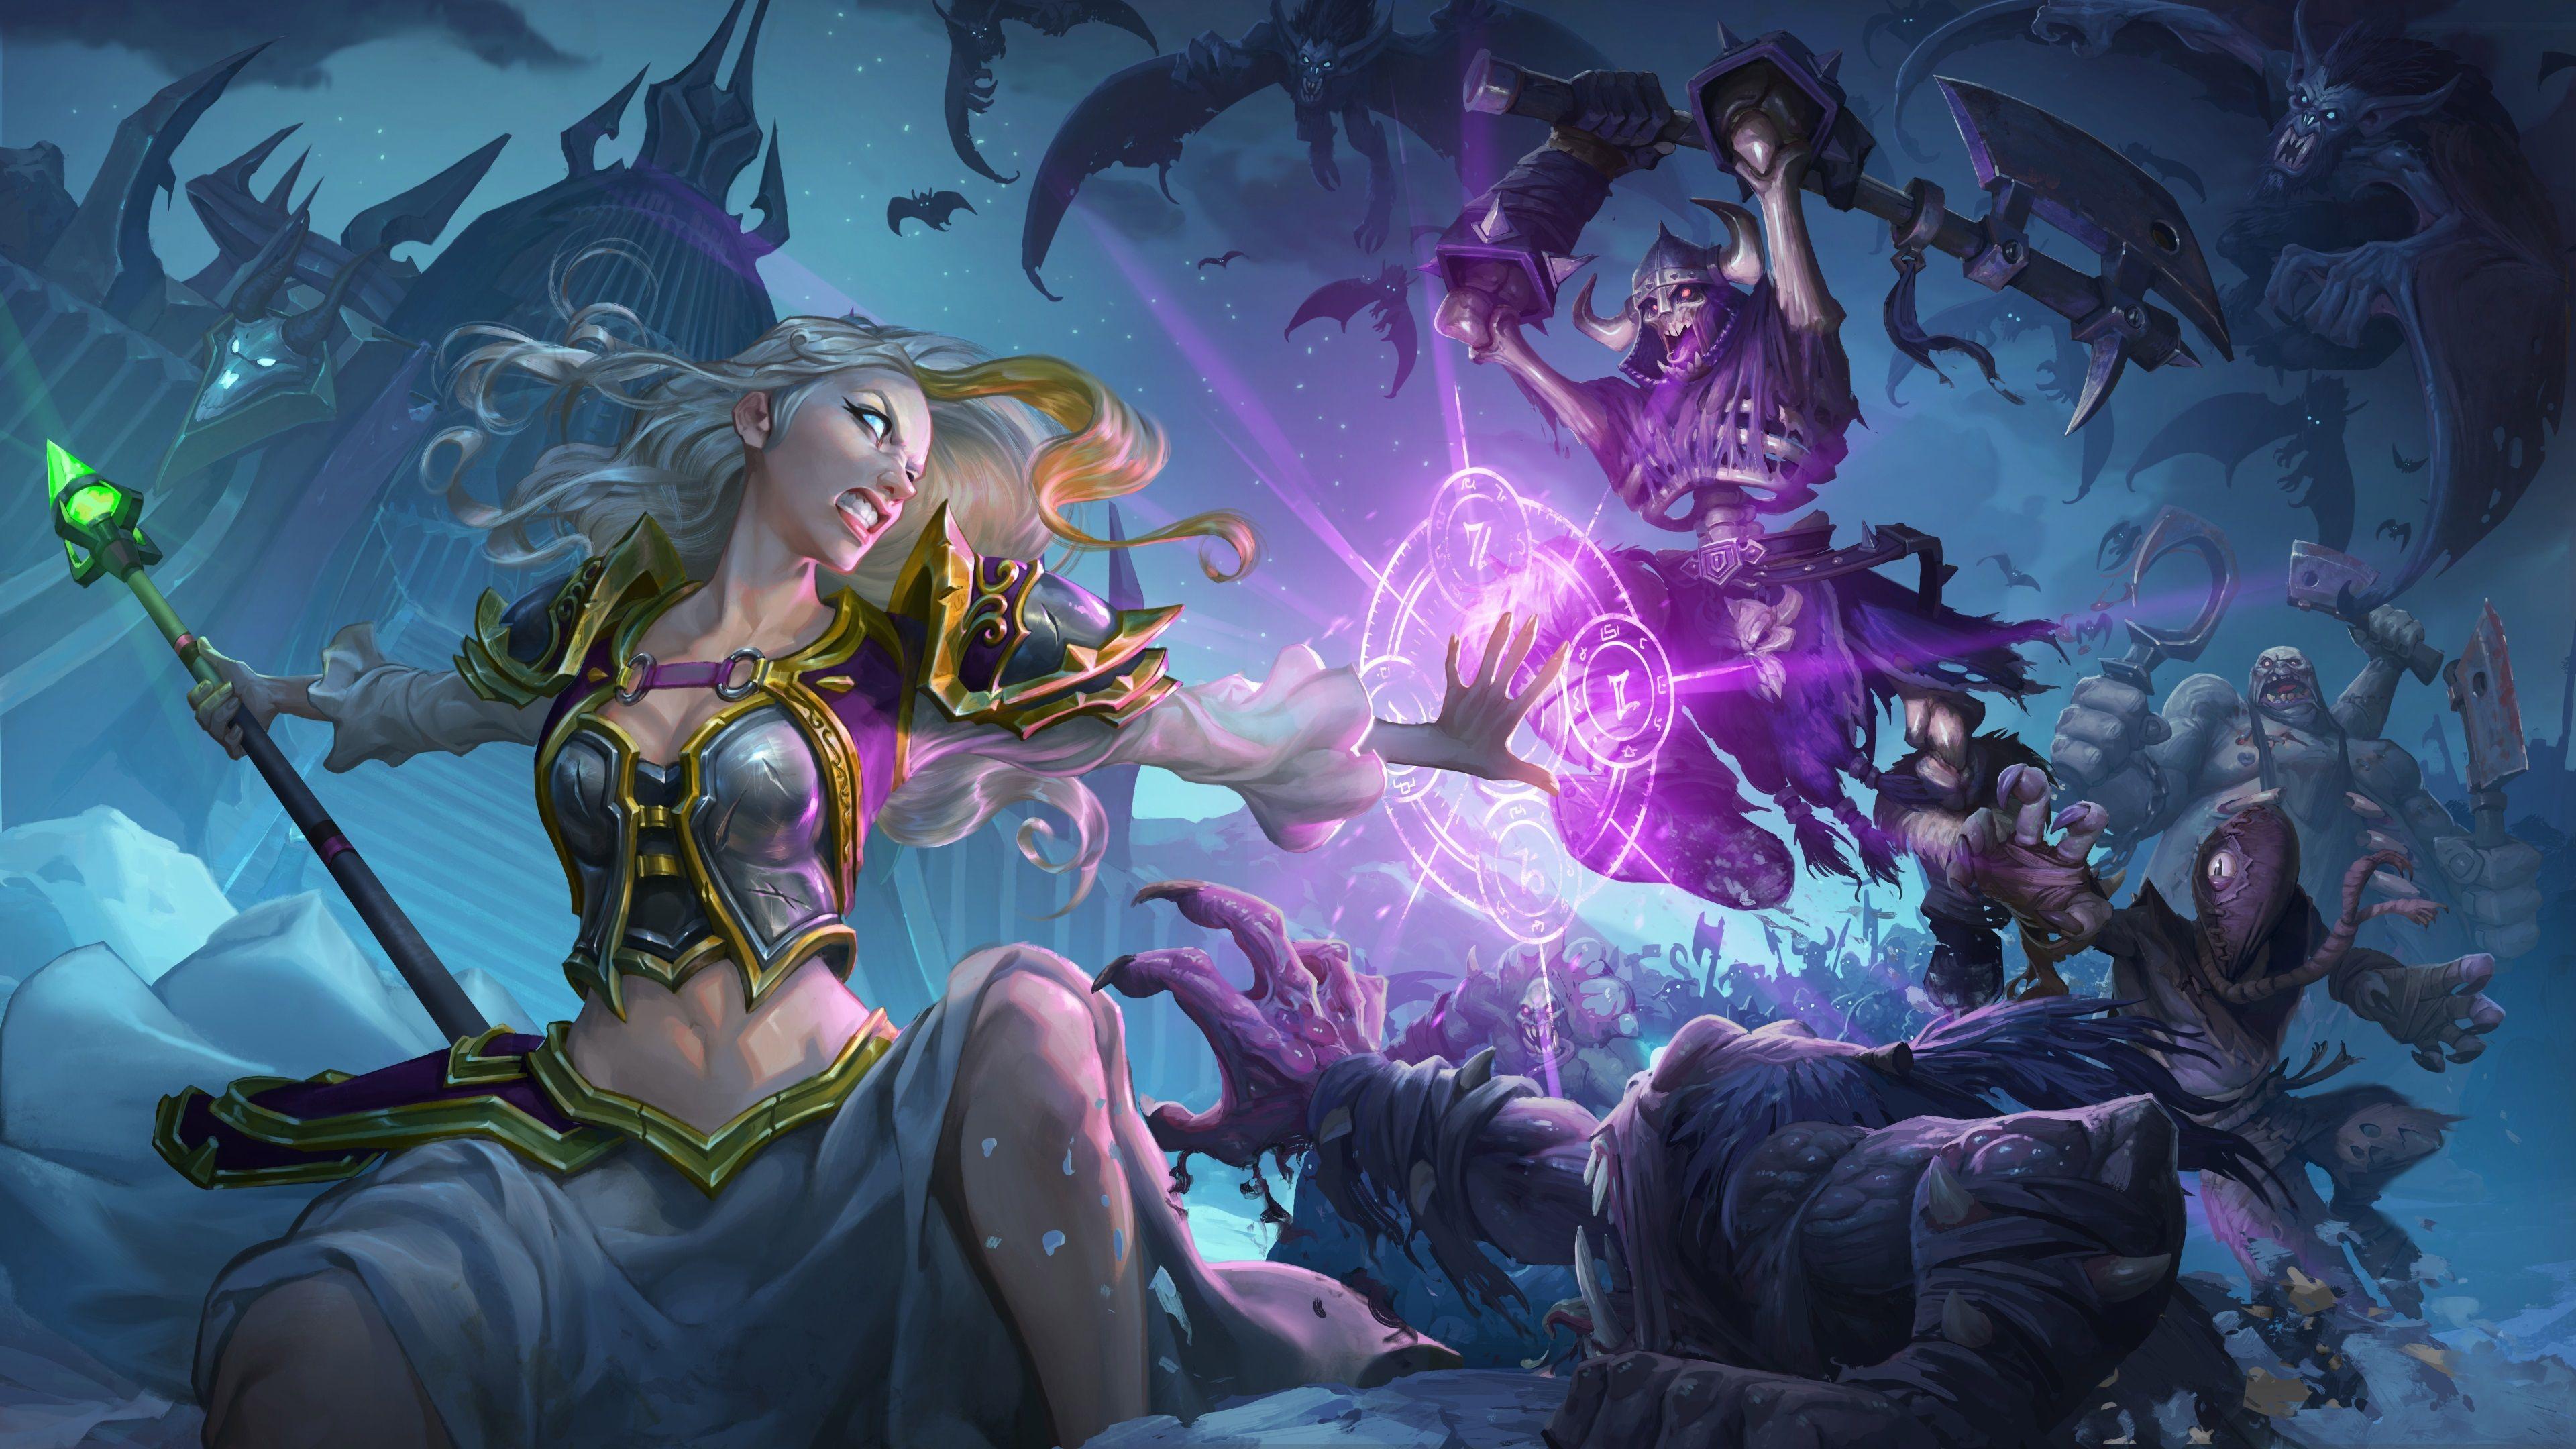 3840x2160 Knights Of The Frozen Throne 4k Free Wallpaper Desktop Background Warcraft Art Hearthstone Heroes Of Warcraft Hearthstone Wallpaper